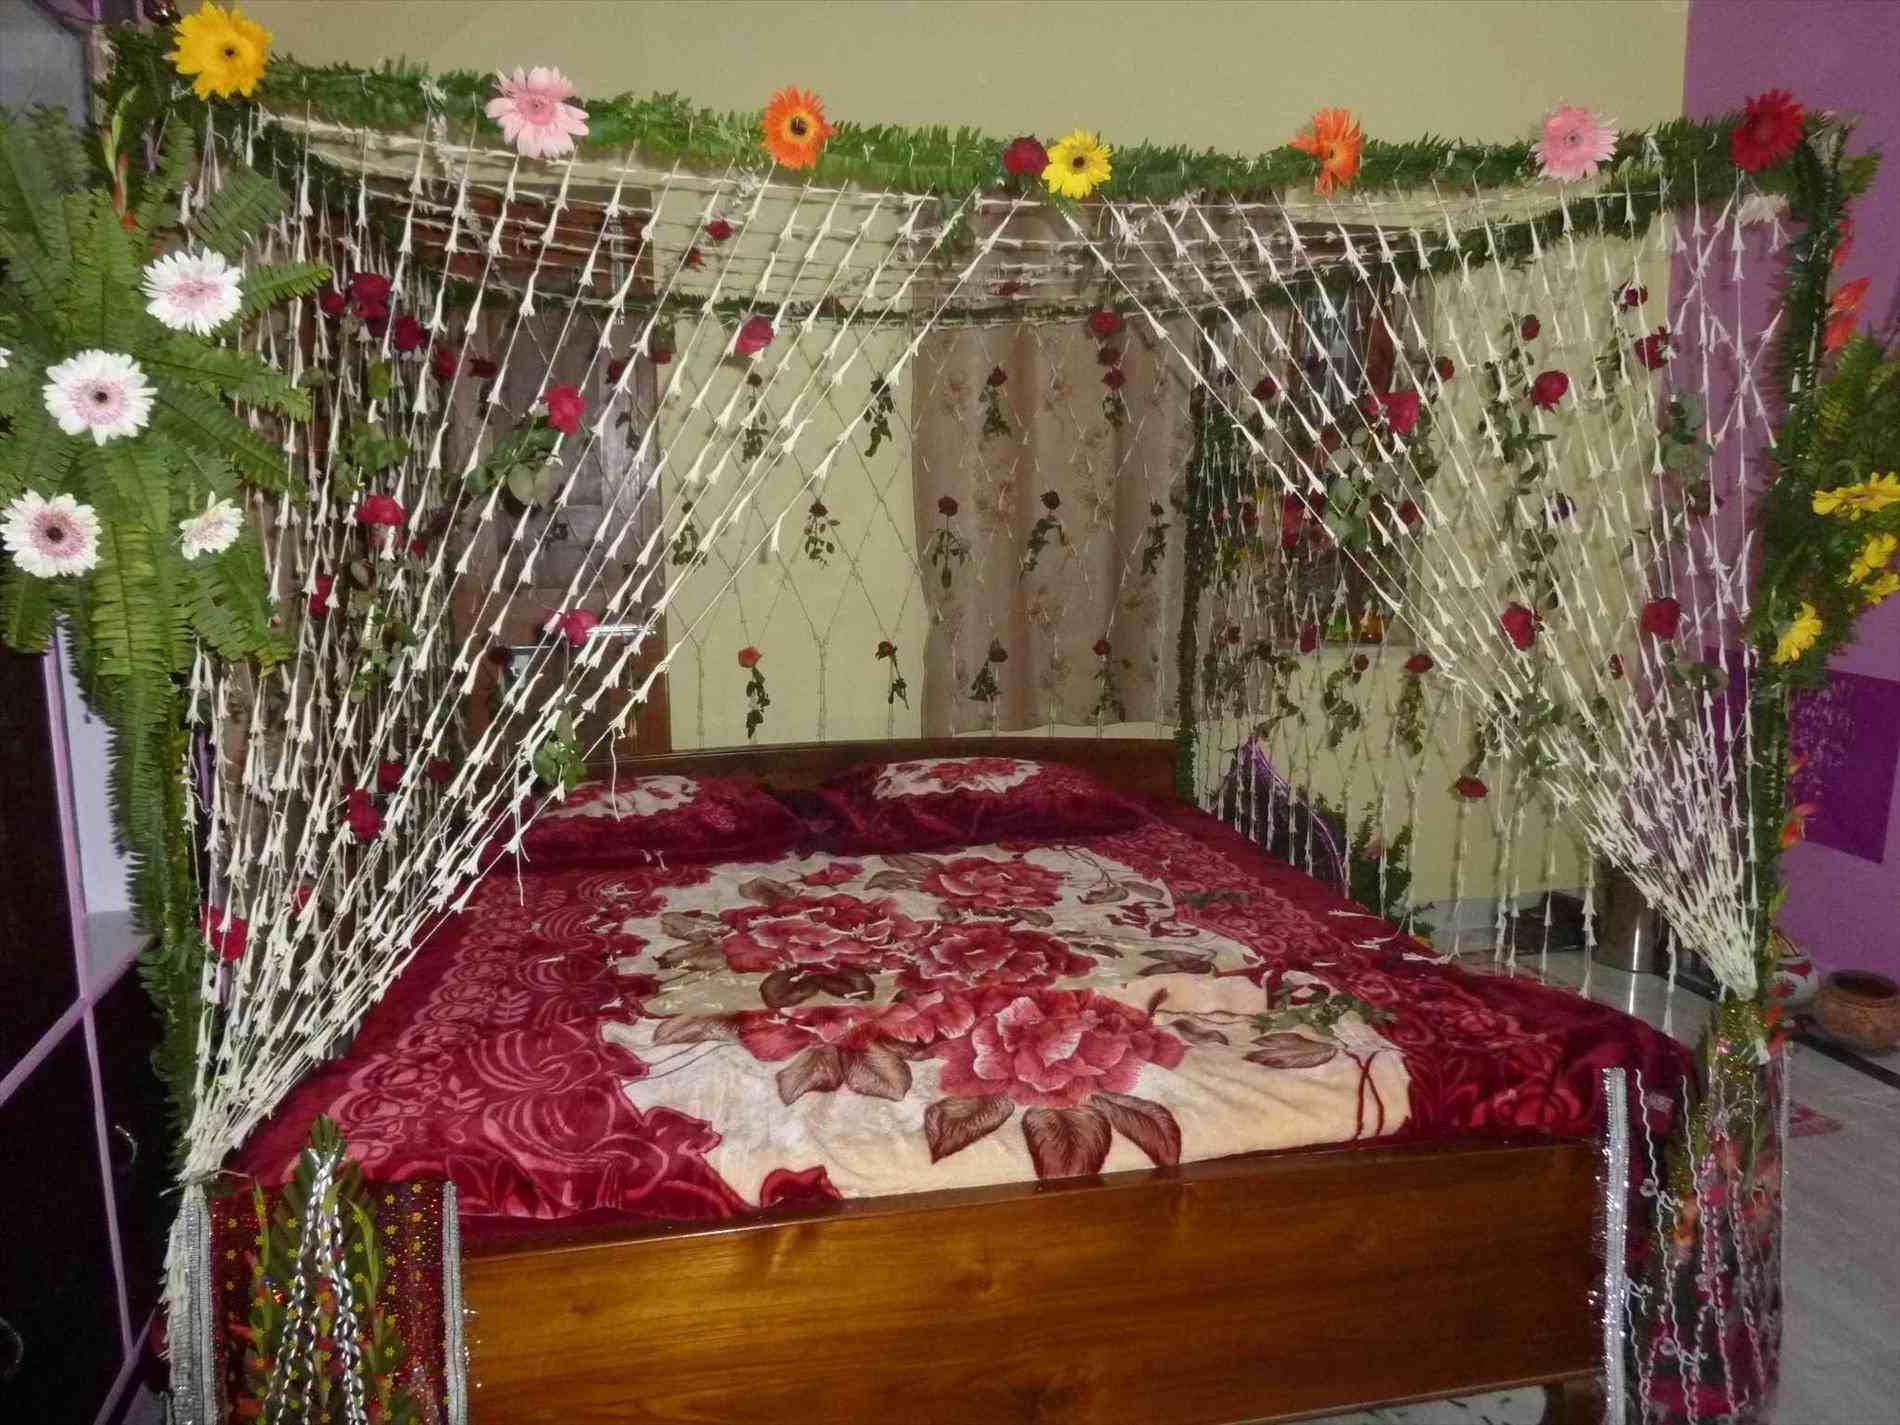 Moments Of Romance Xox Valentines Bedroom Valentine Bedroom Decor Romantic Valentine